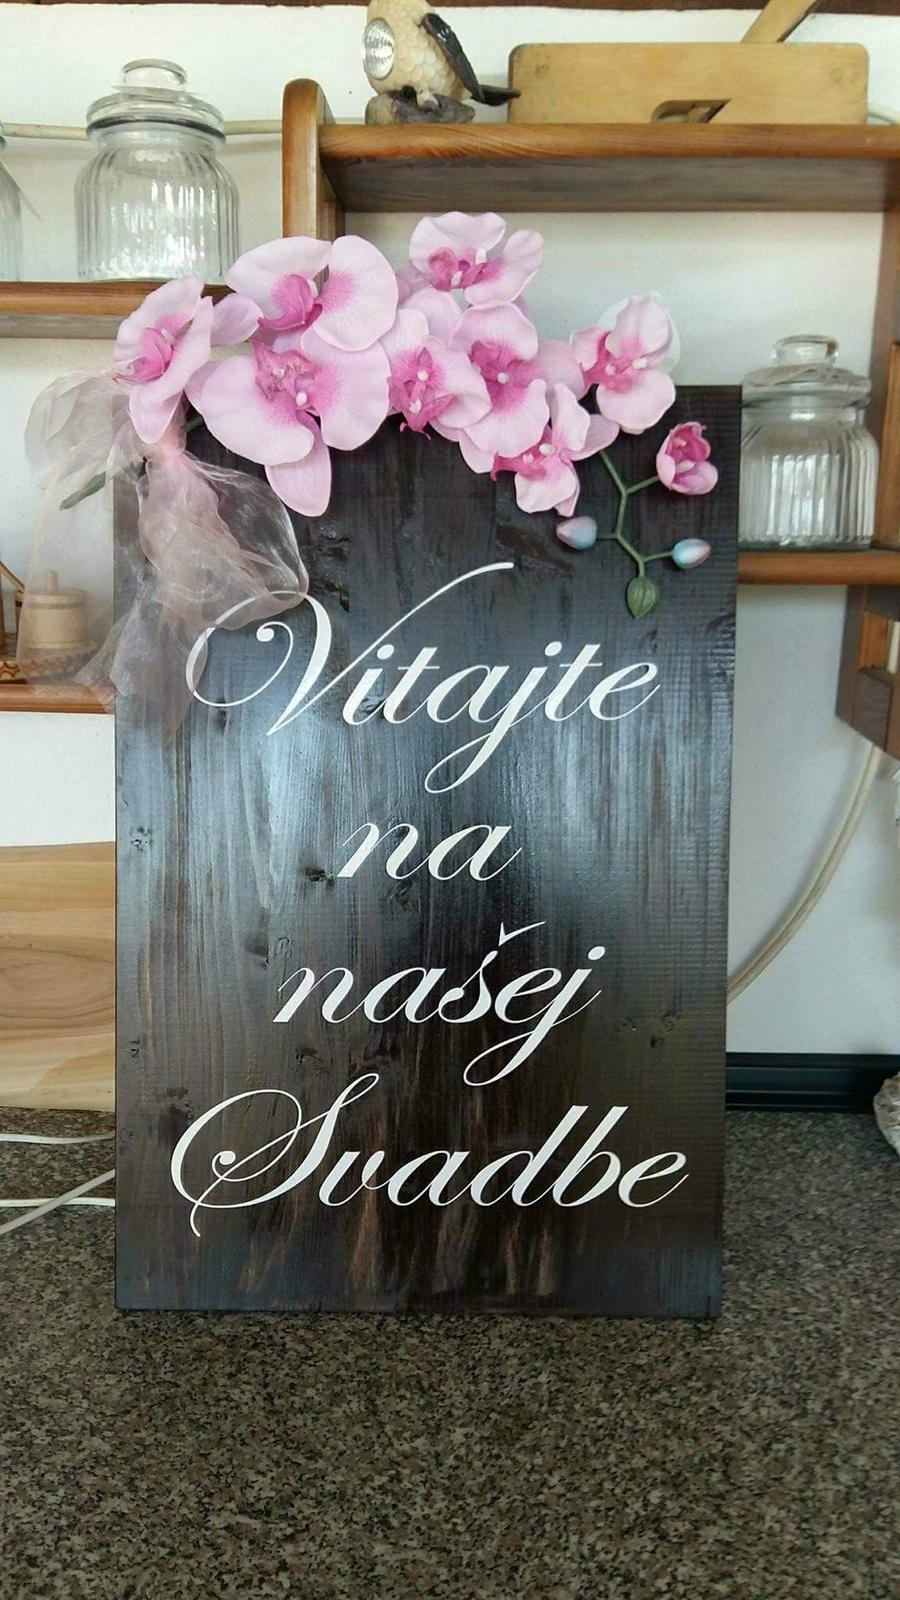 Welcome napis s kvetmi - Obrázok č. 1